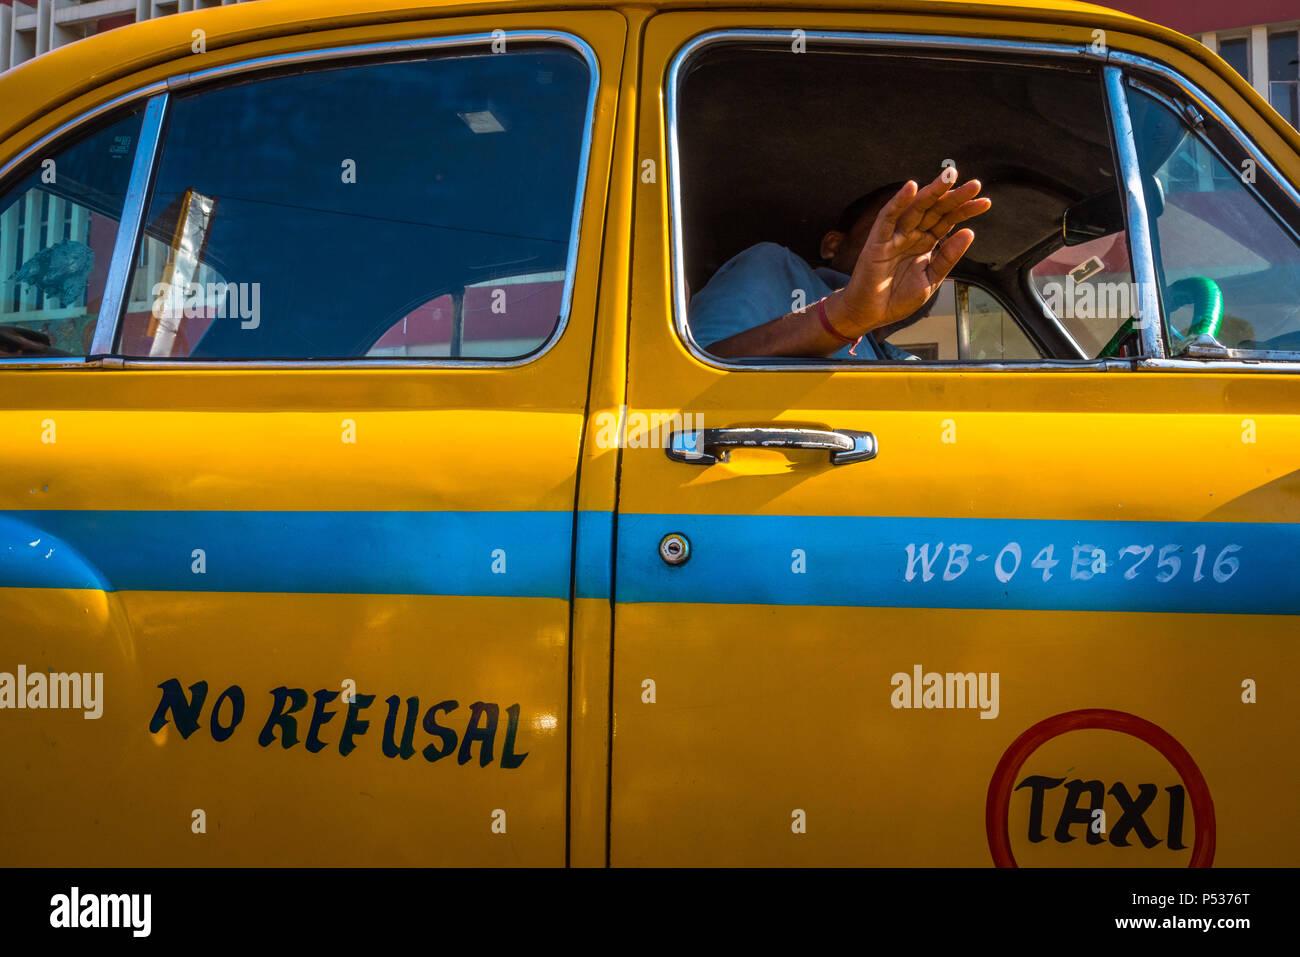 Taxi driver negarse desde el Hindustan Ambassador en Kolkata, India. Imagen De Stock